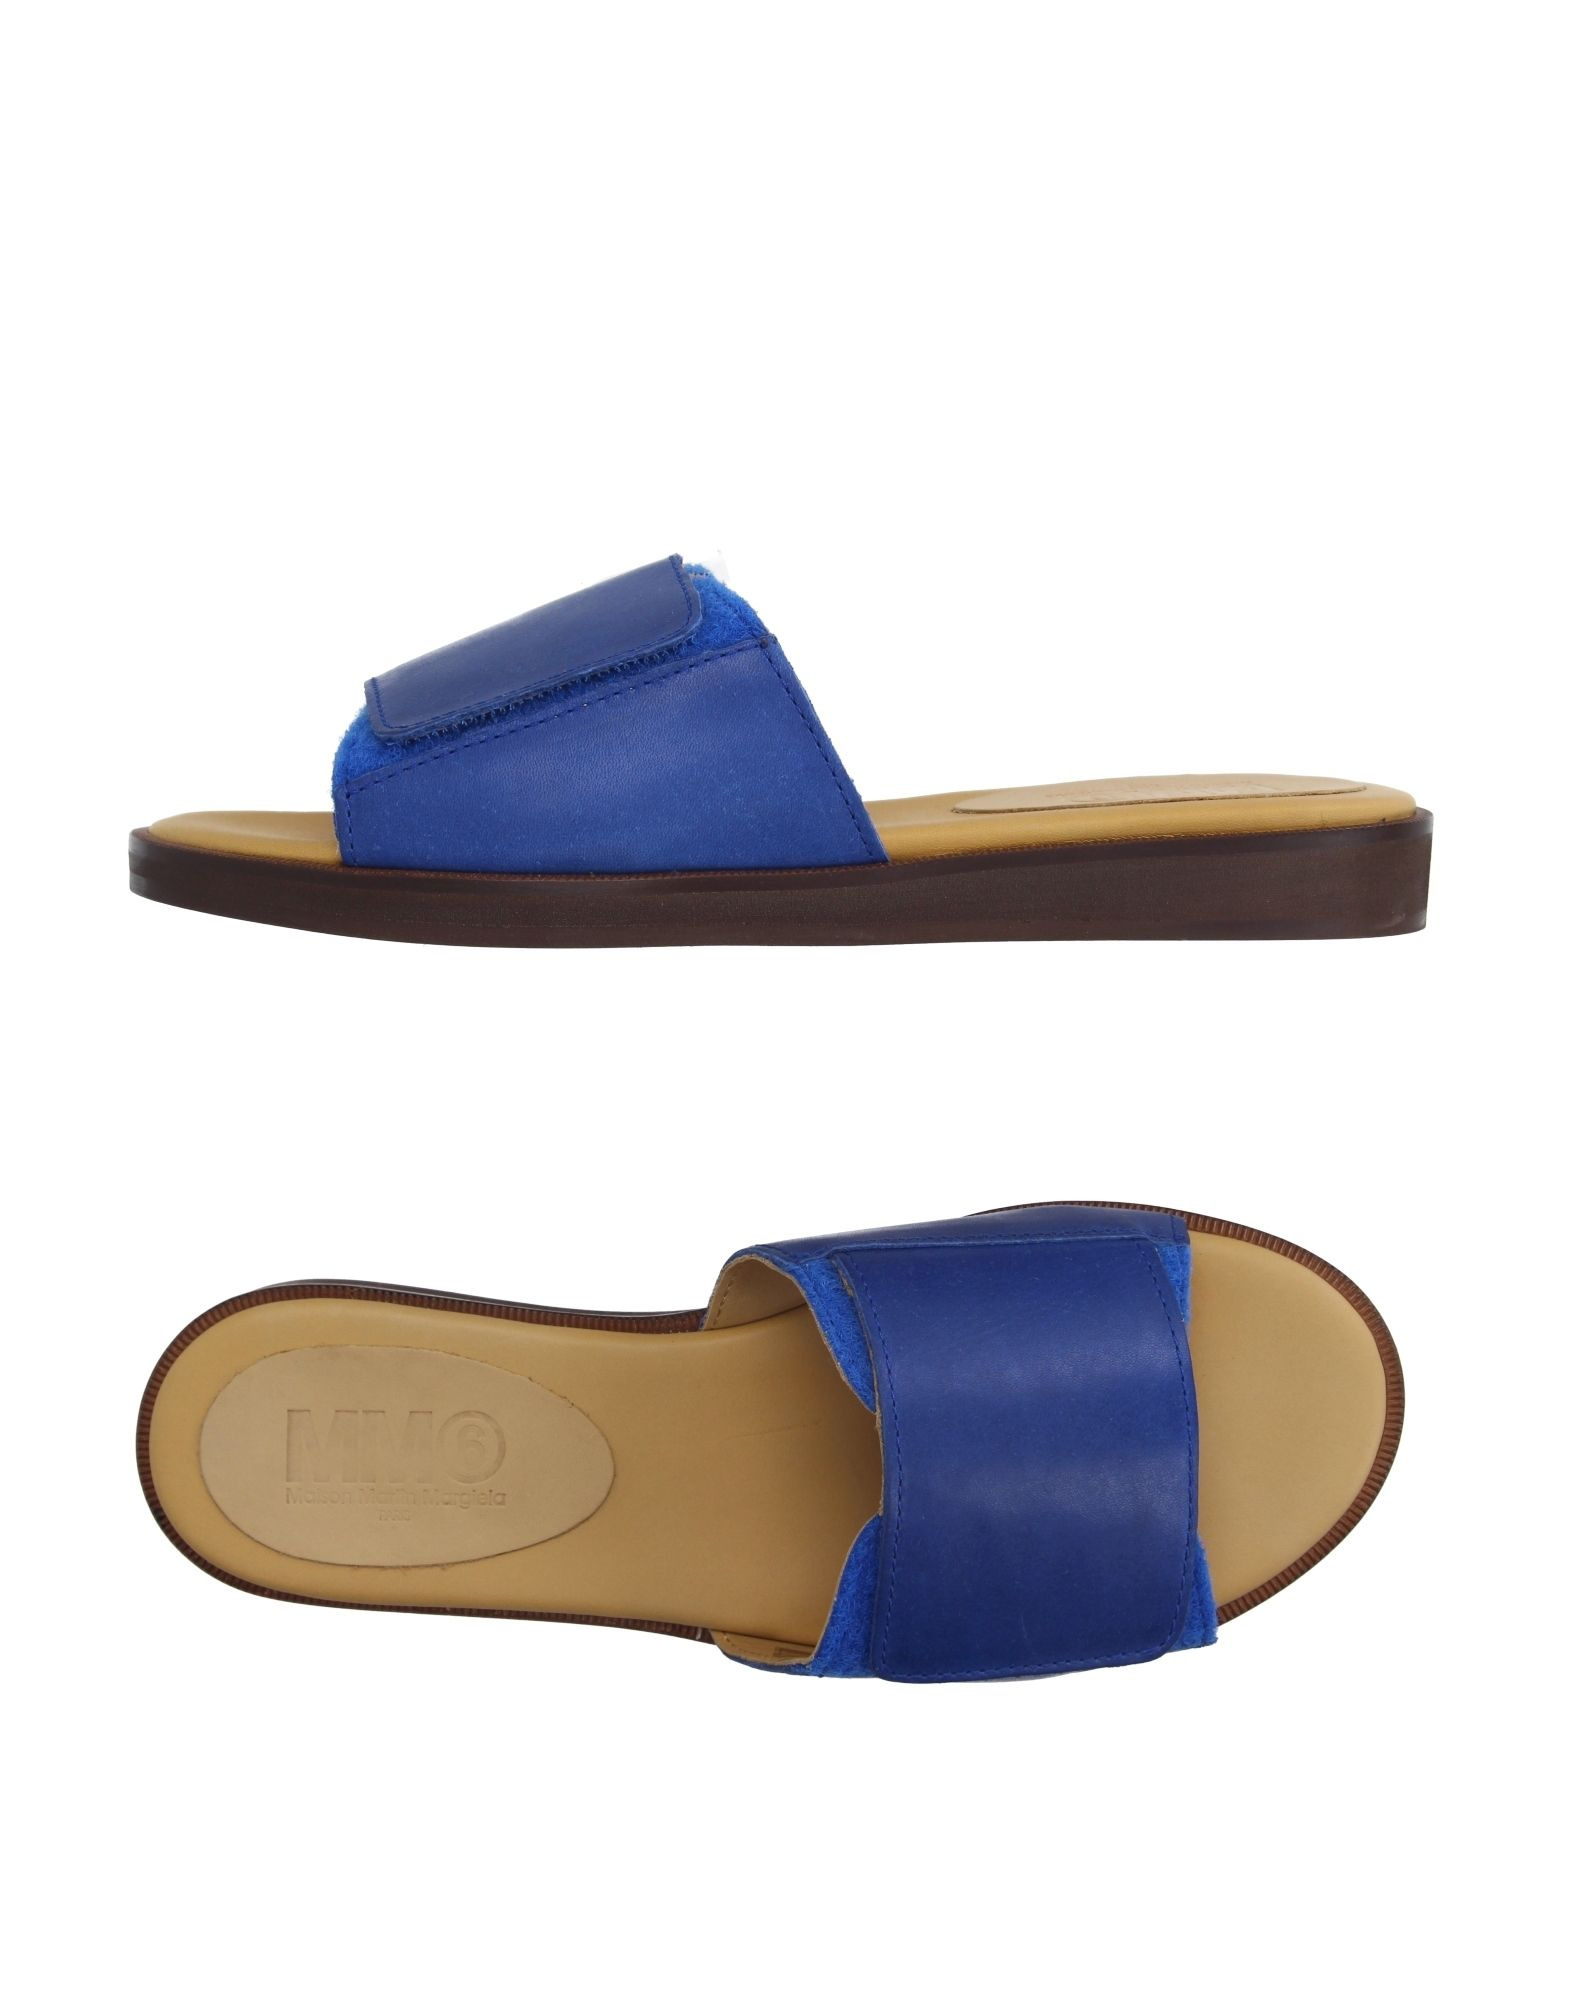 Stilvolle billige Sandalen Schuhe Mm6 Maison Margiela Sandalen billige Damen  44915021UA a5219b